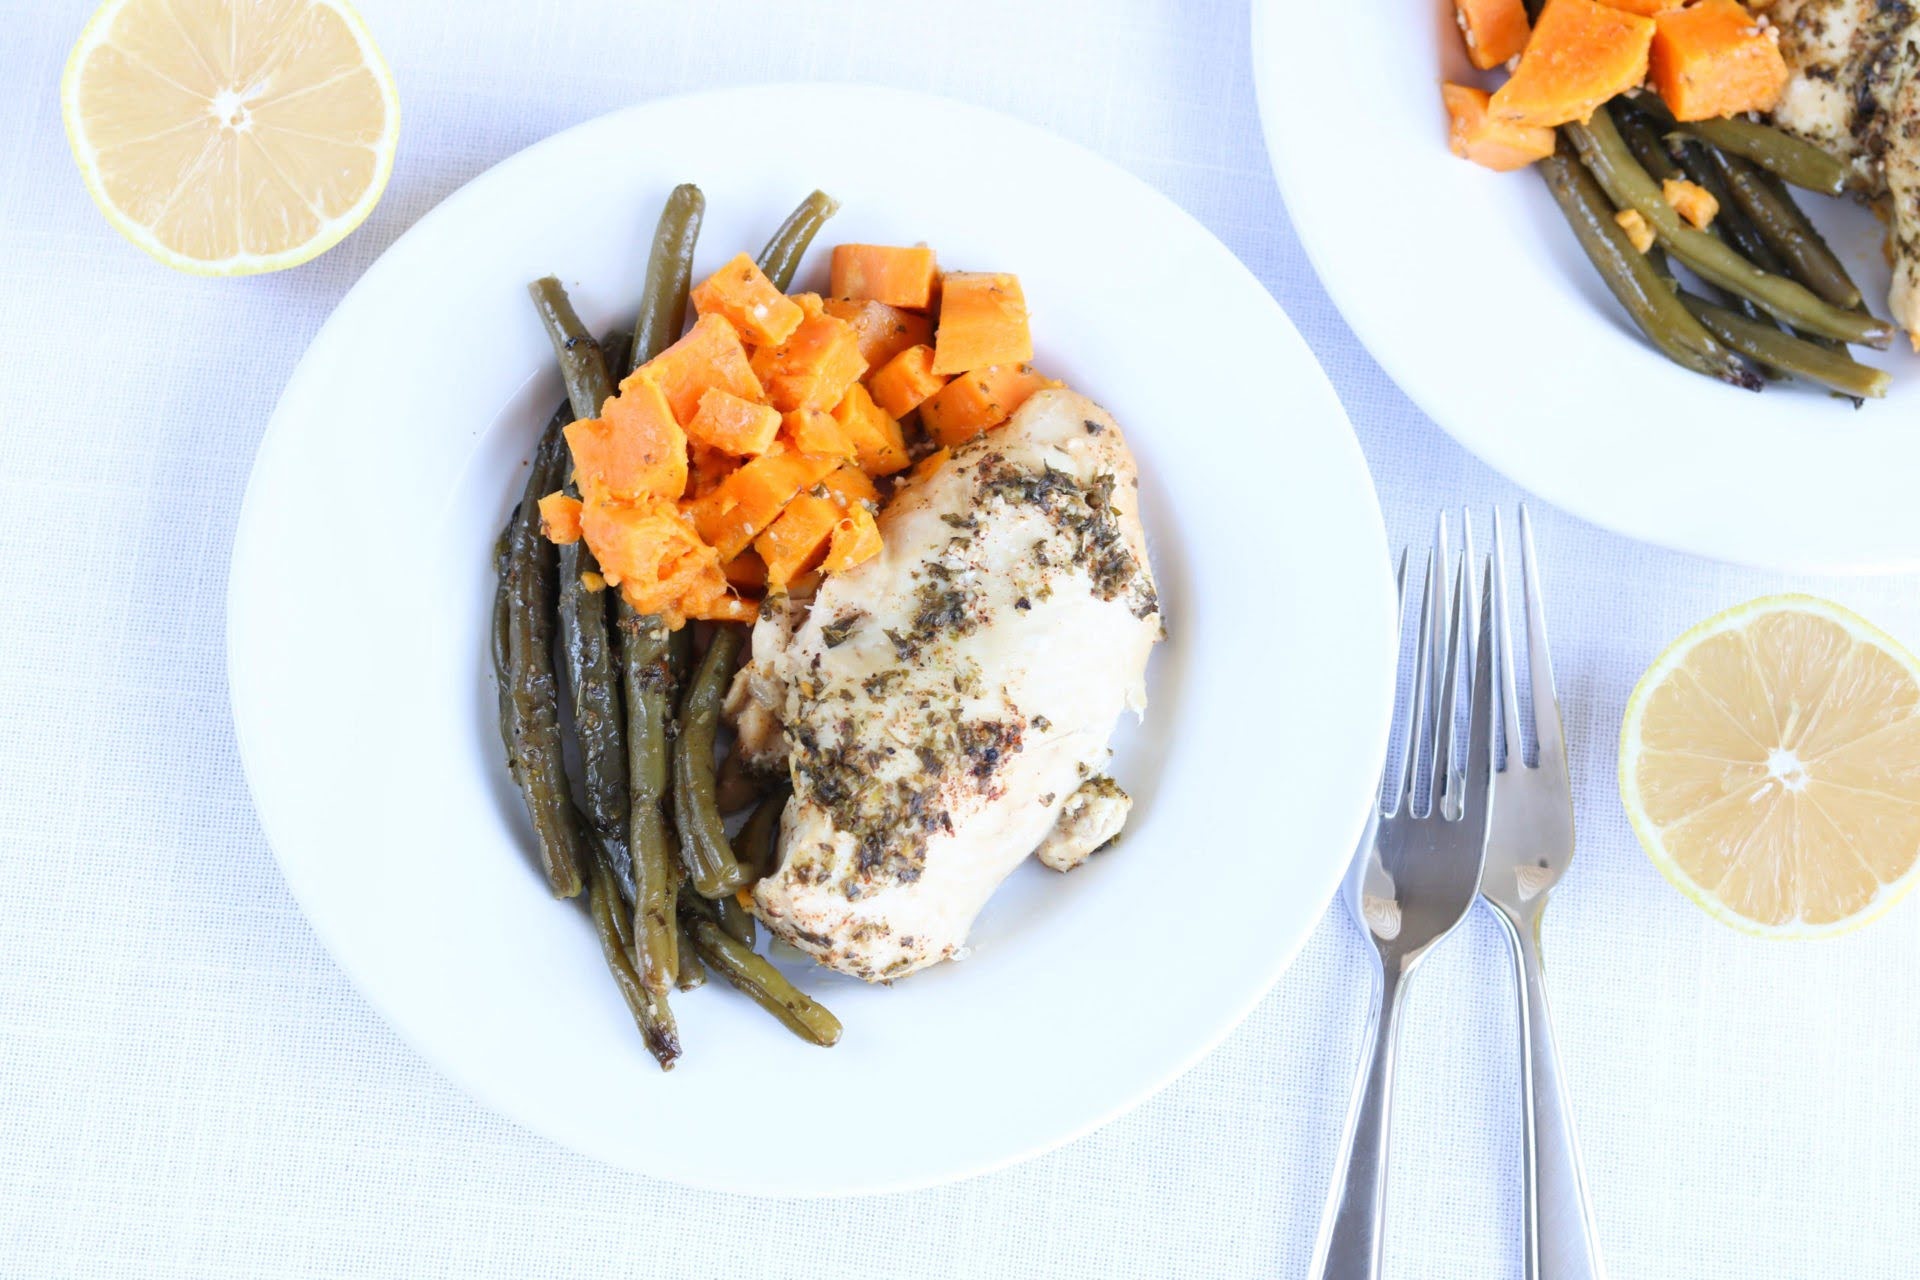 Crockpot Lemon Chicken And Herb Veggies